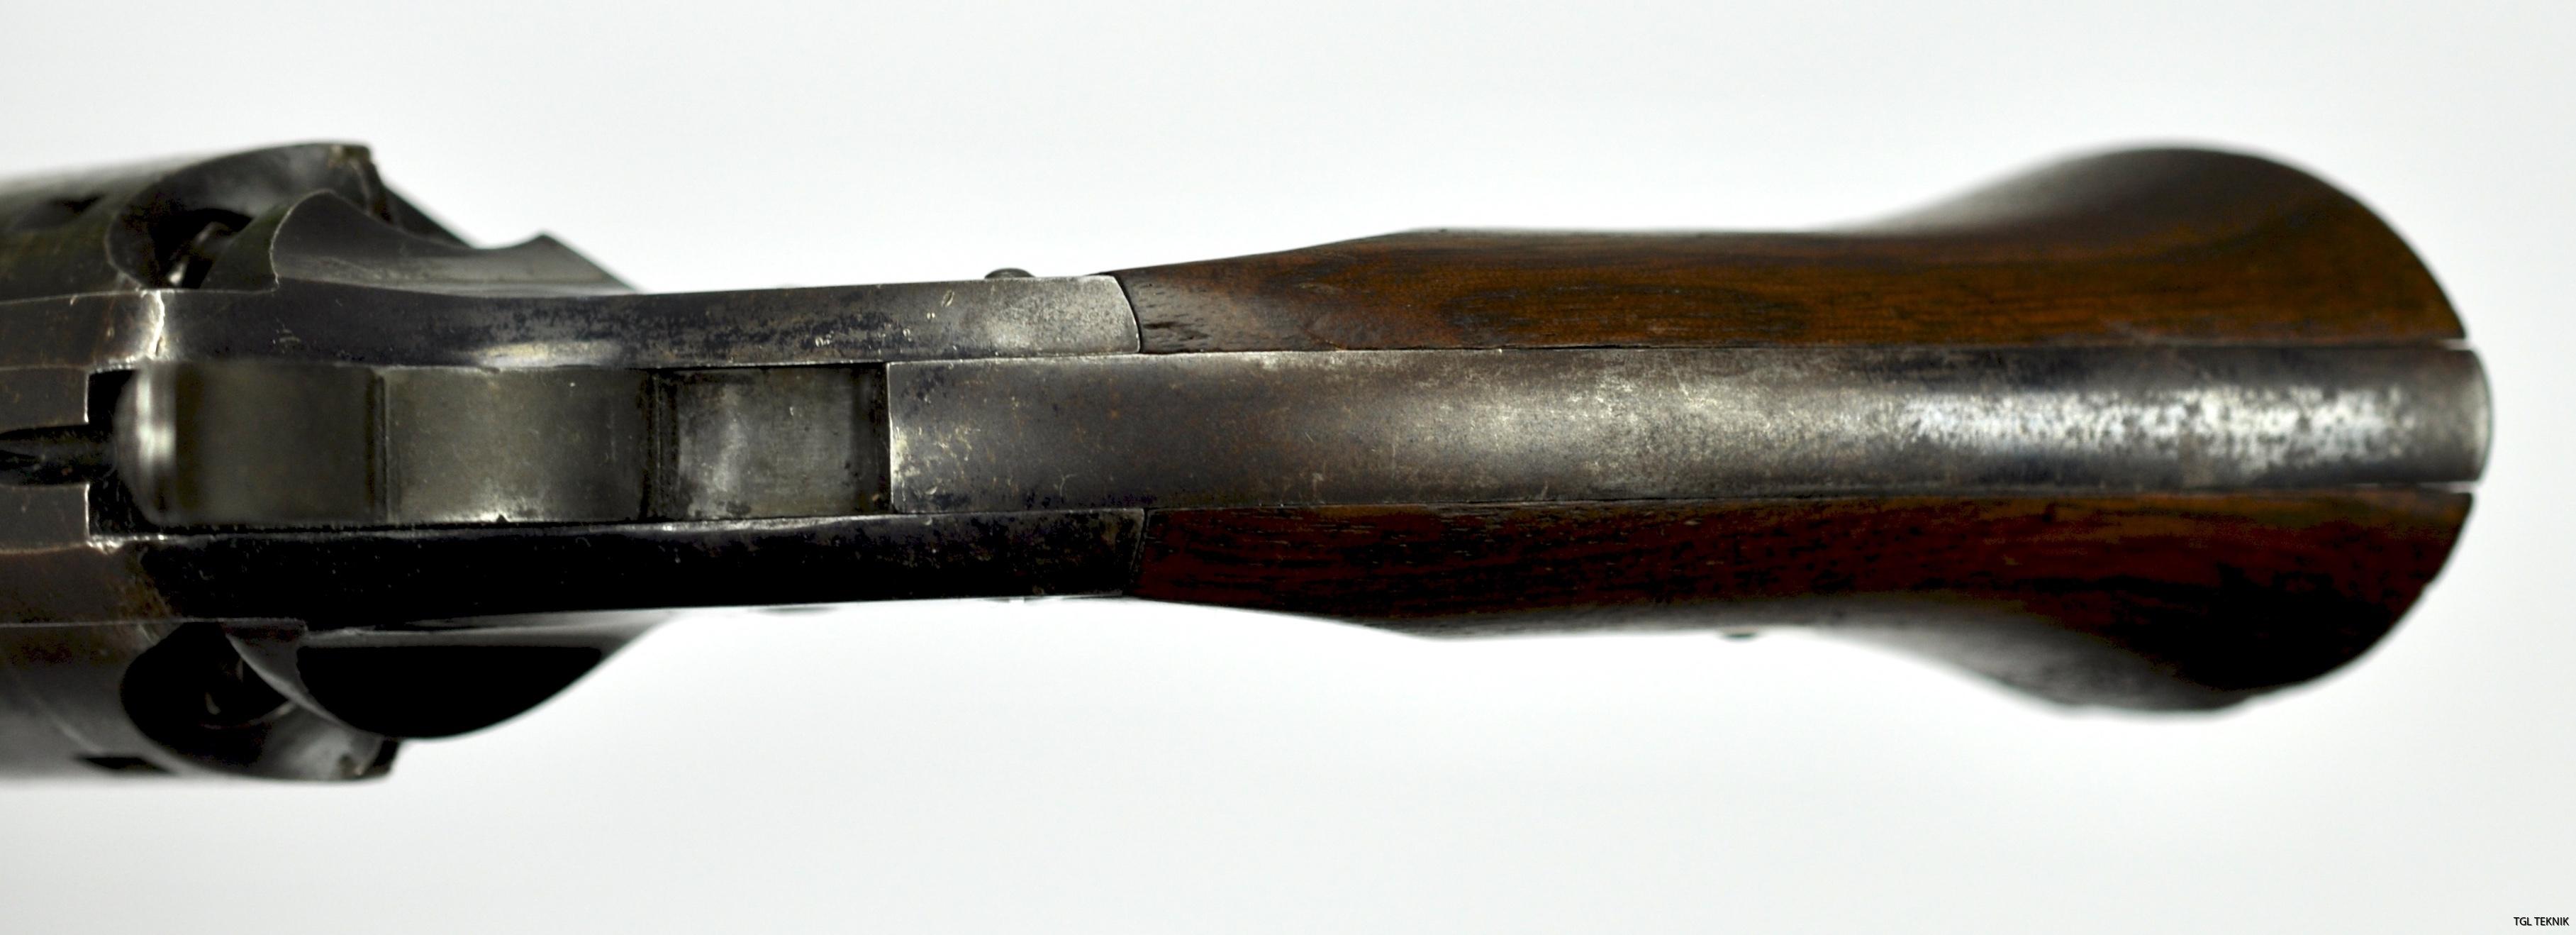 fullsizeoutput_1831